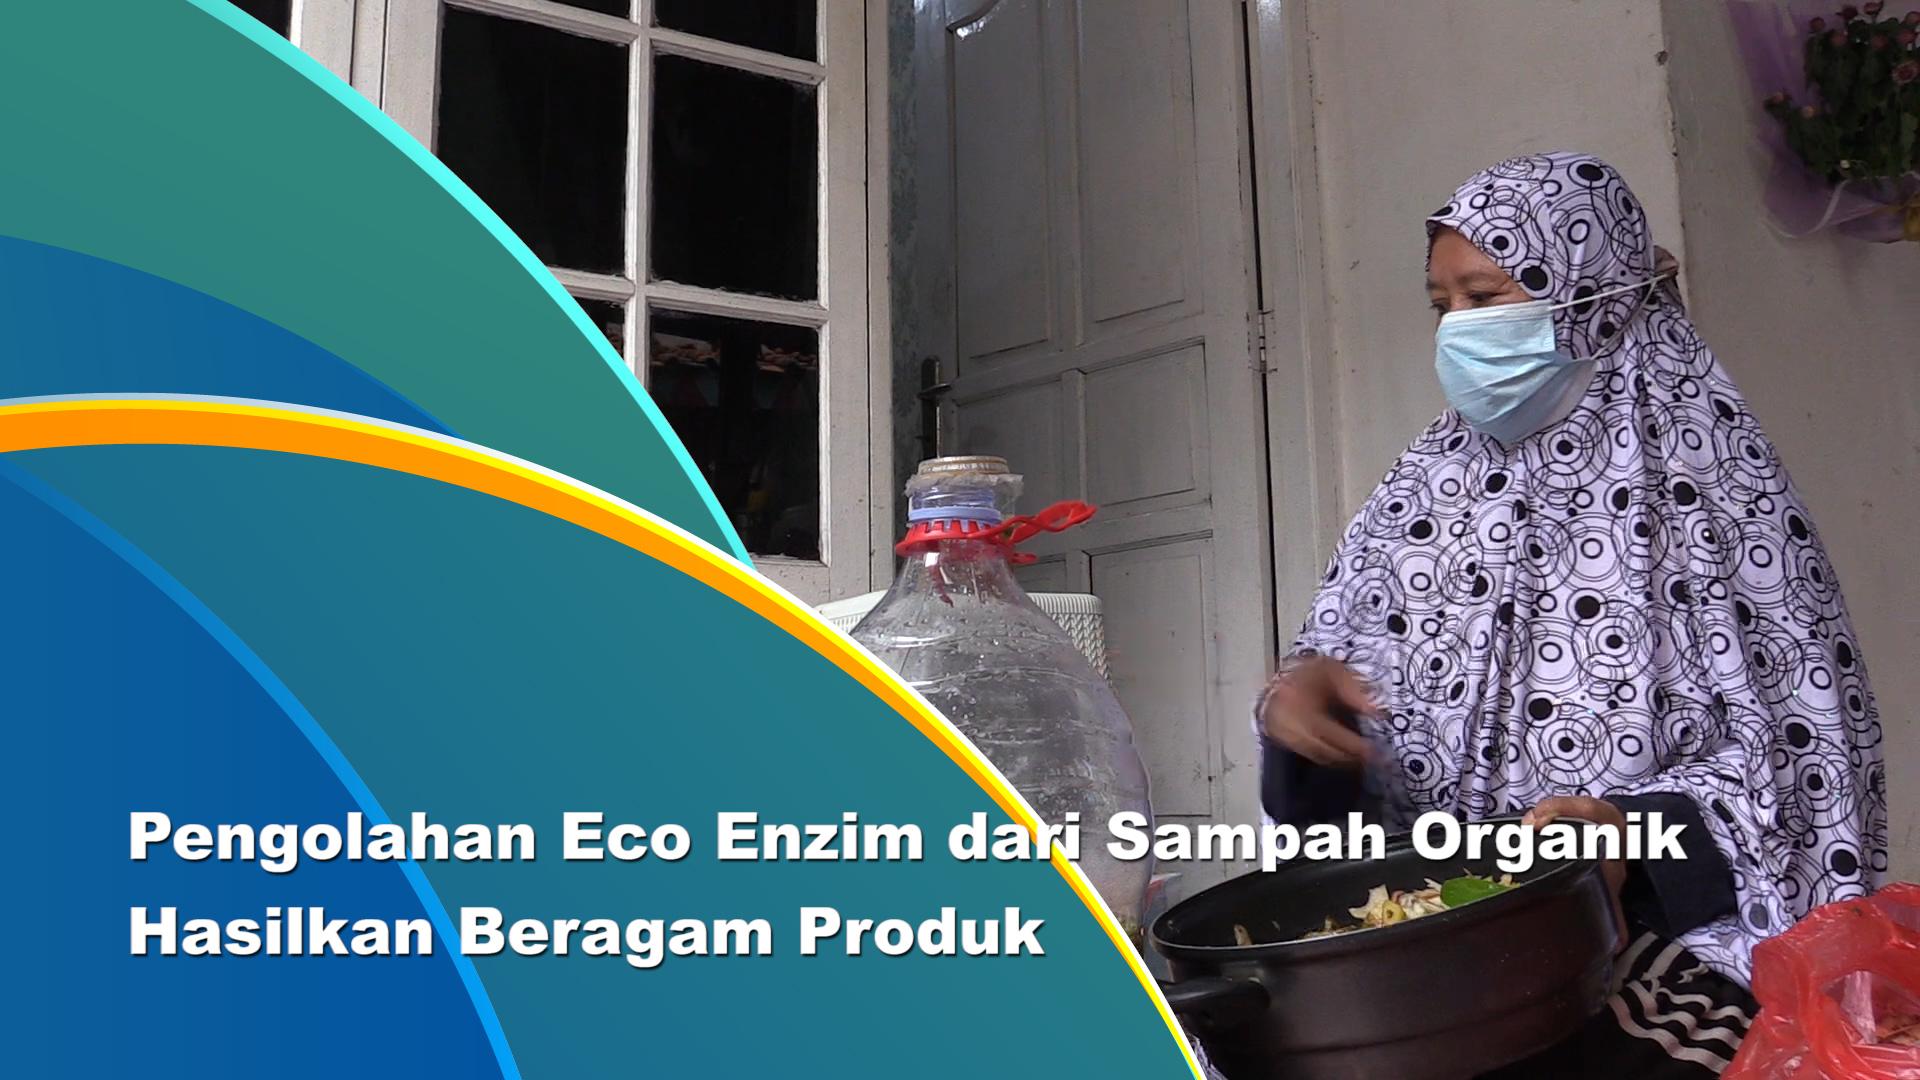 Warga Jagakarsa Sukses Olah Sampah Organik Jadi Eco Enzim